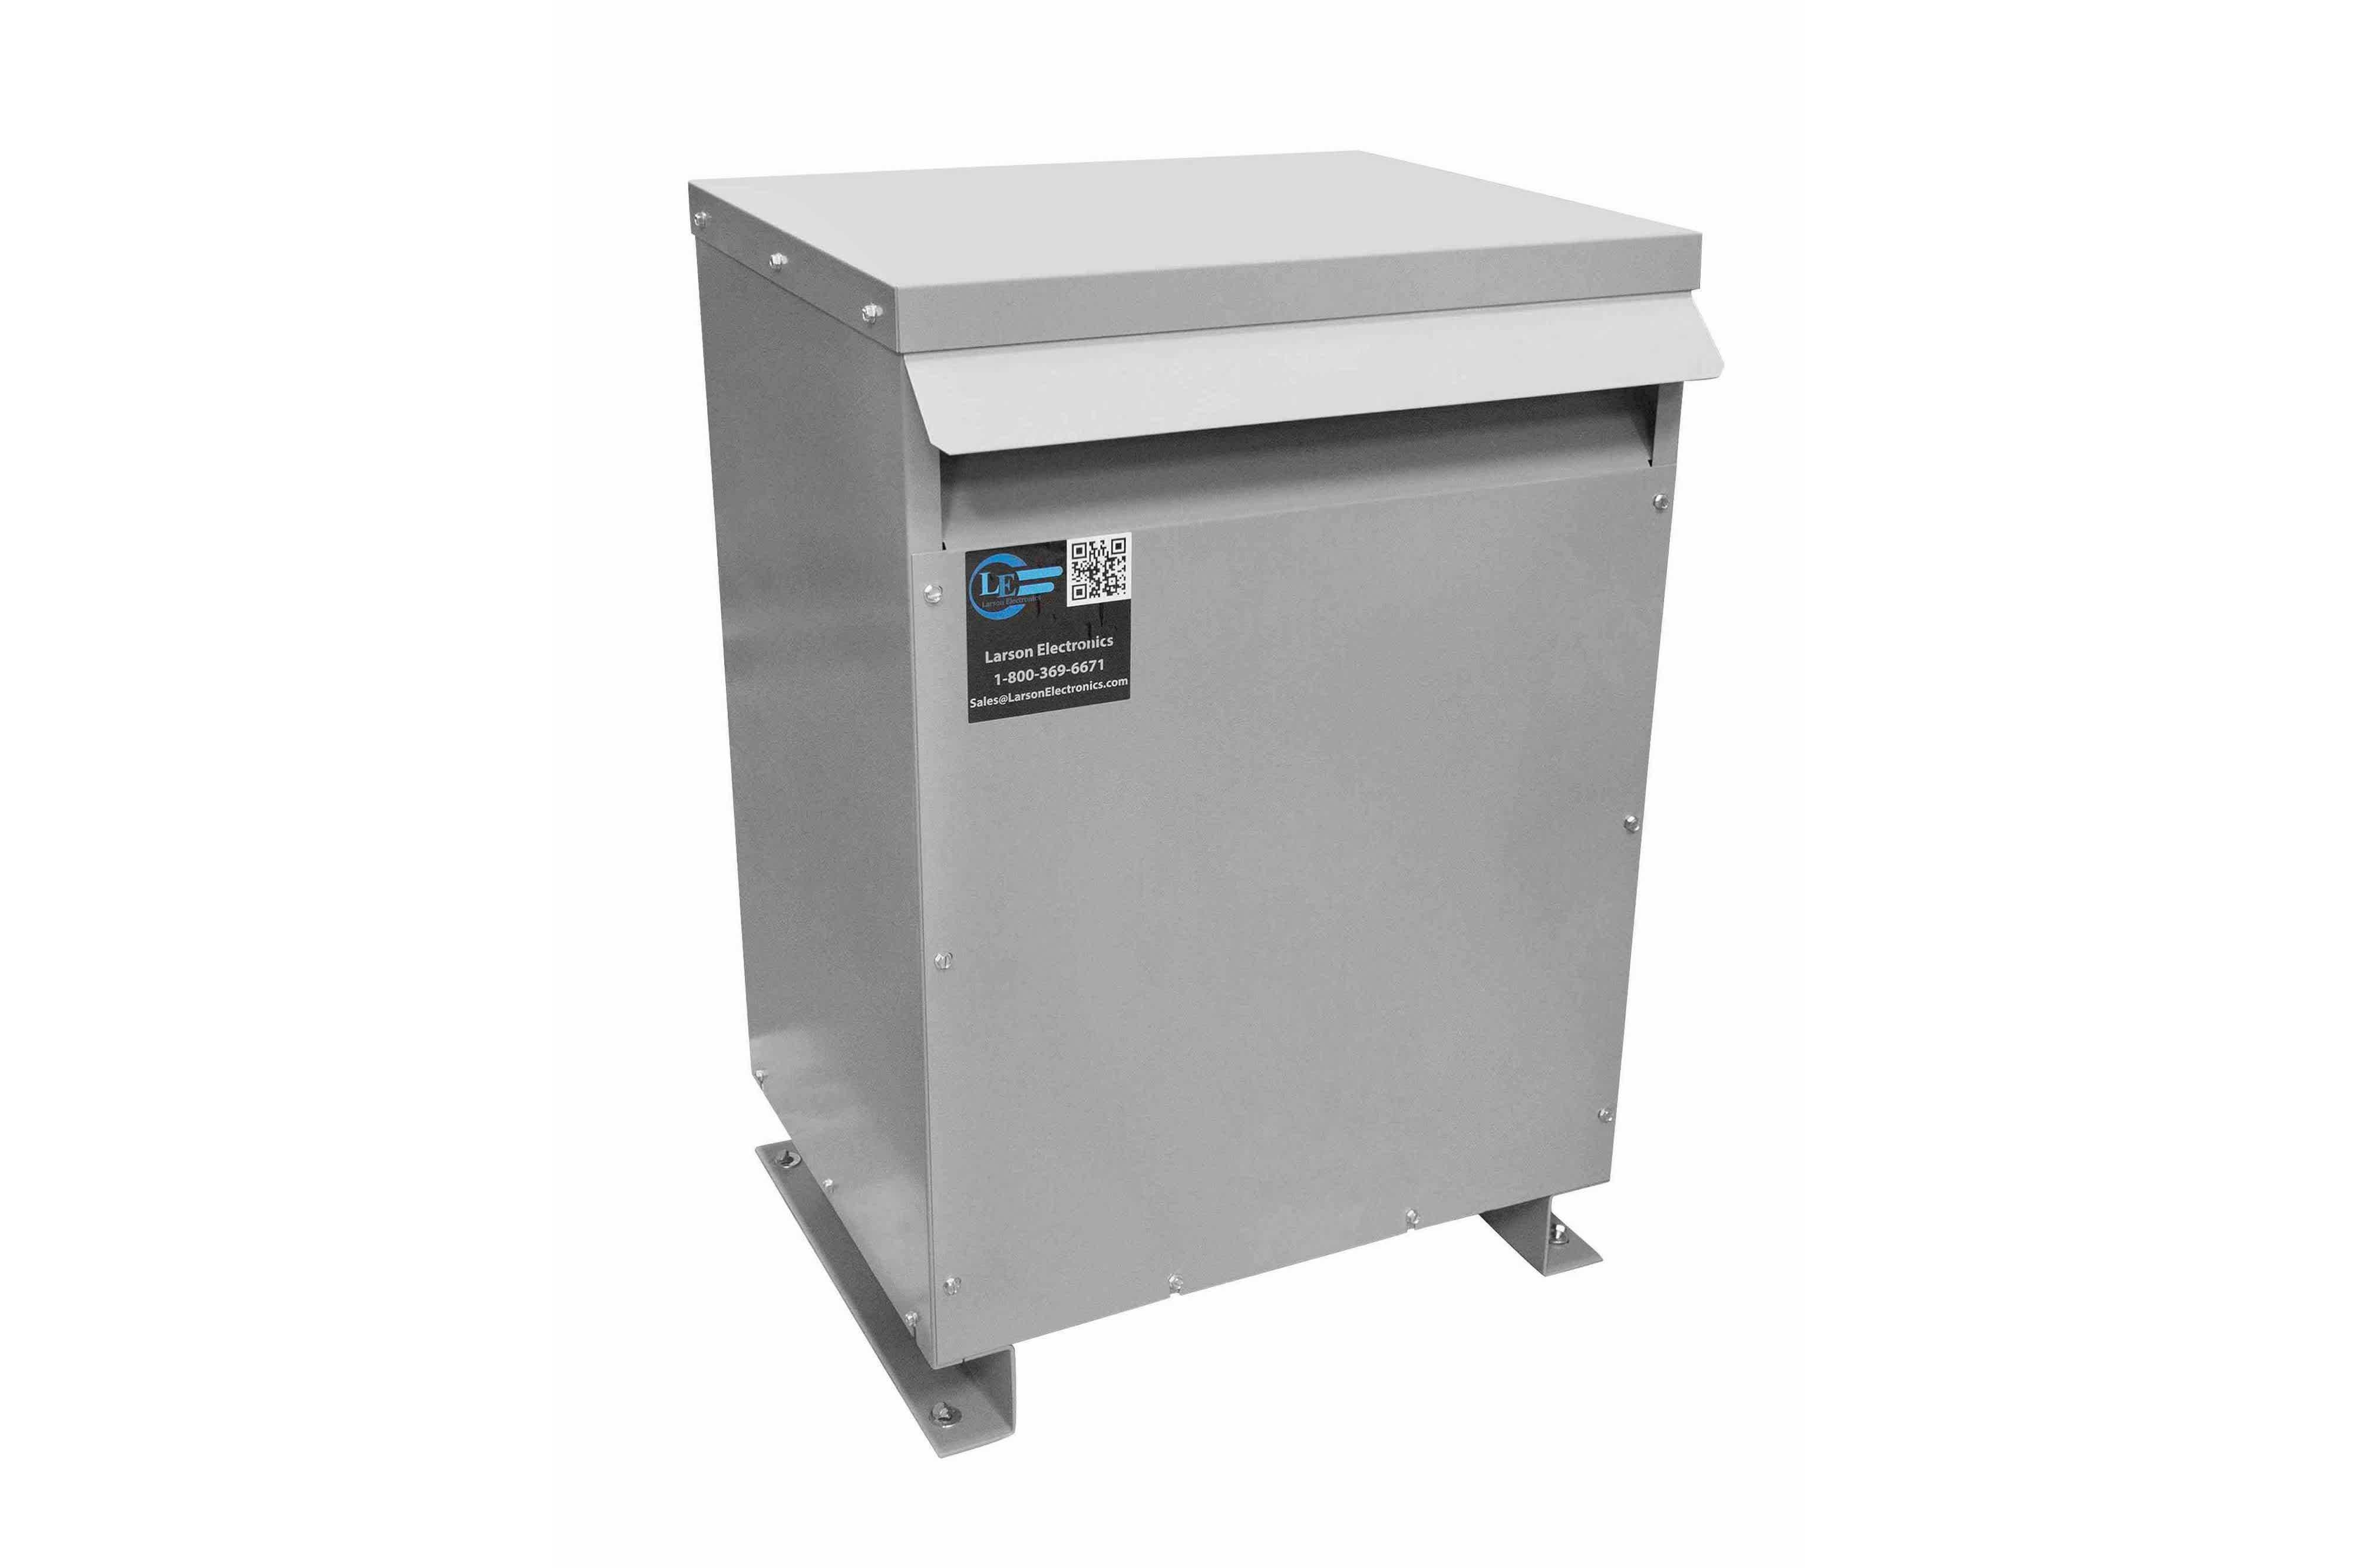 36 kVA 3PH Isolation Transformer, 208V Wye Primary, 415V Delta Secondary, N3R, Ventilated, 60 Hz